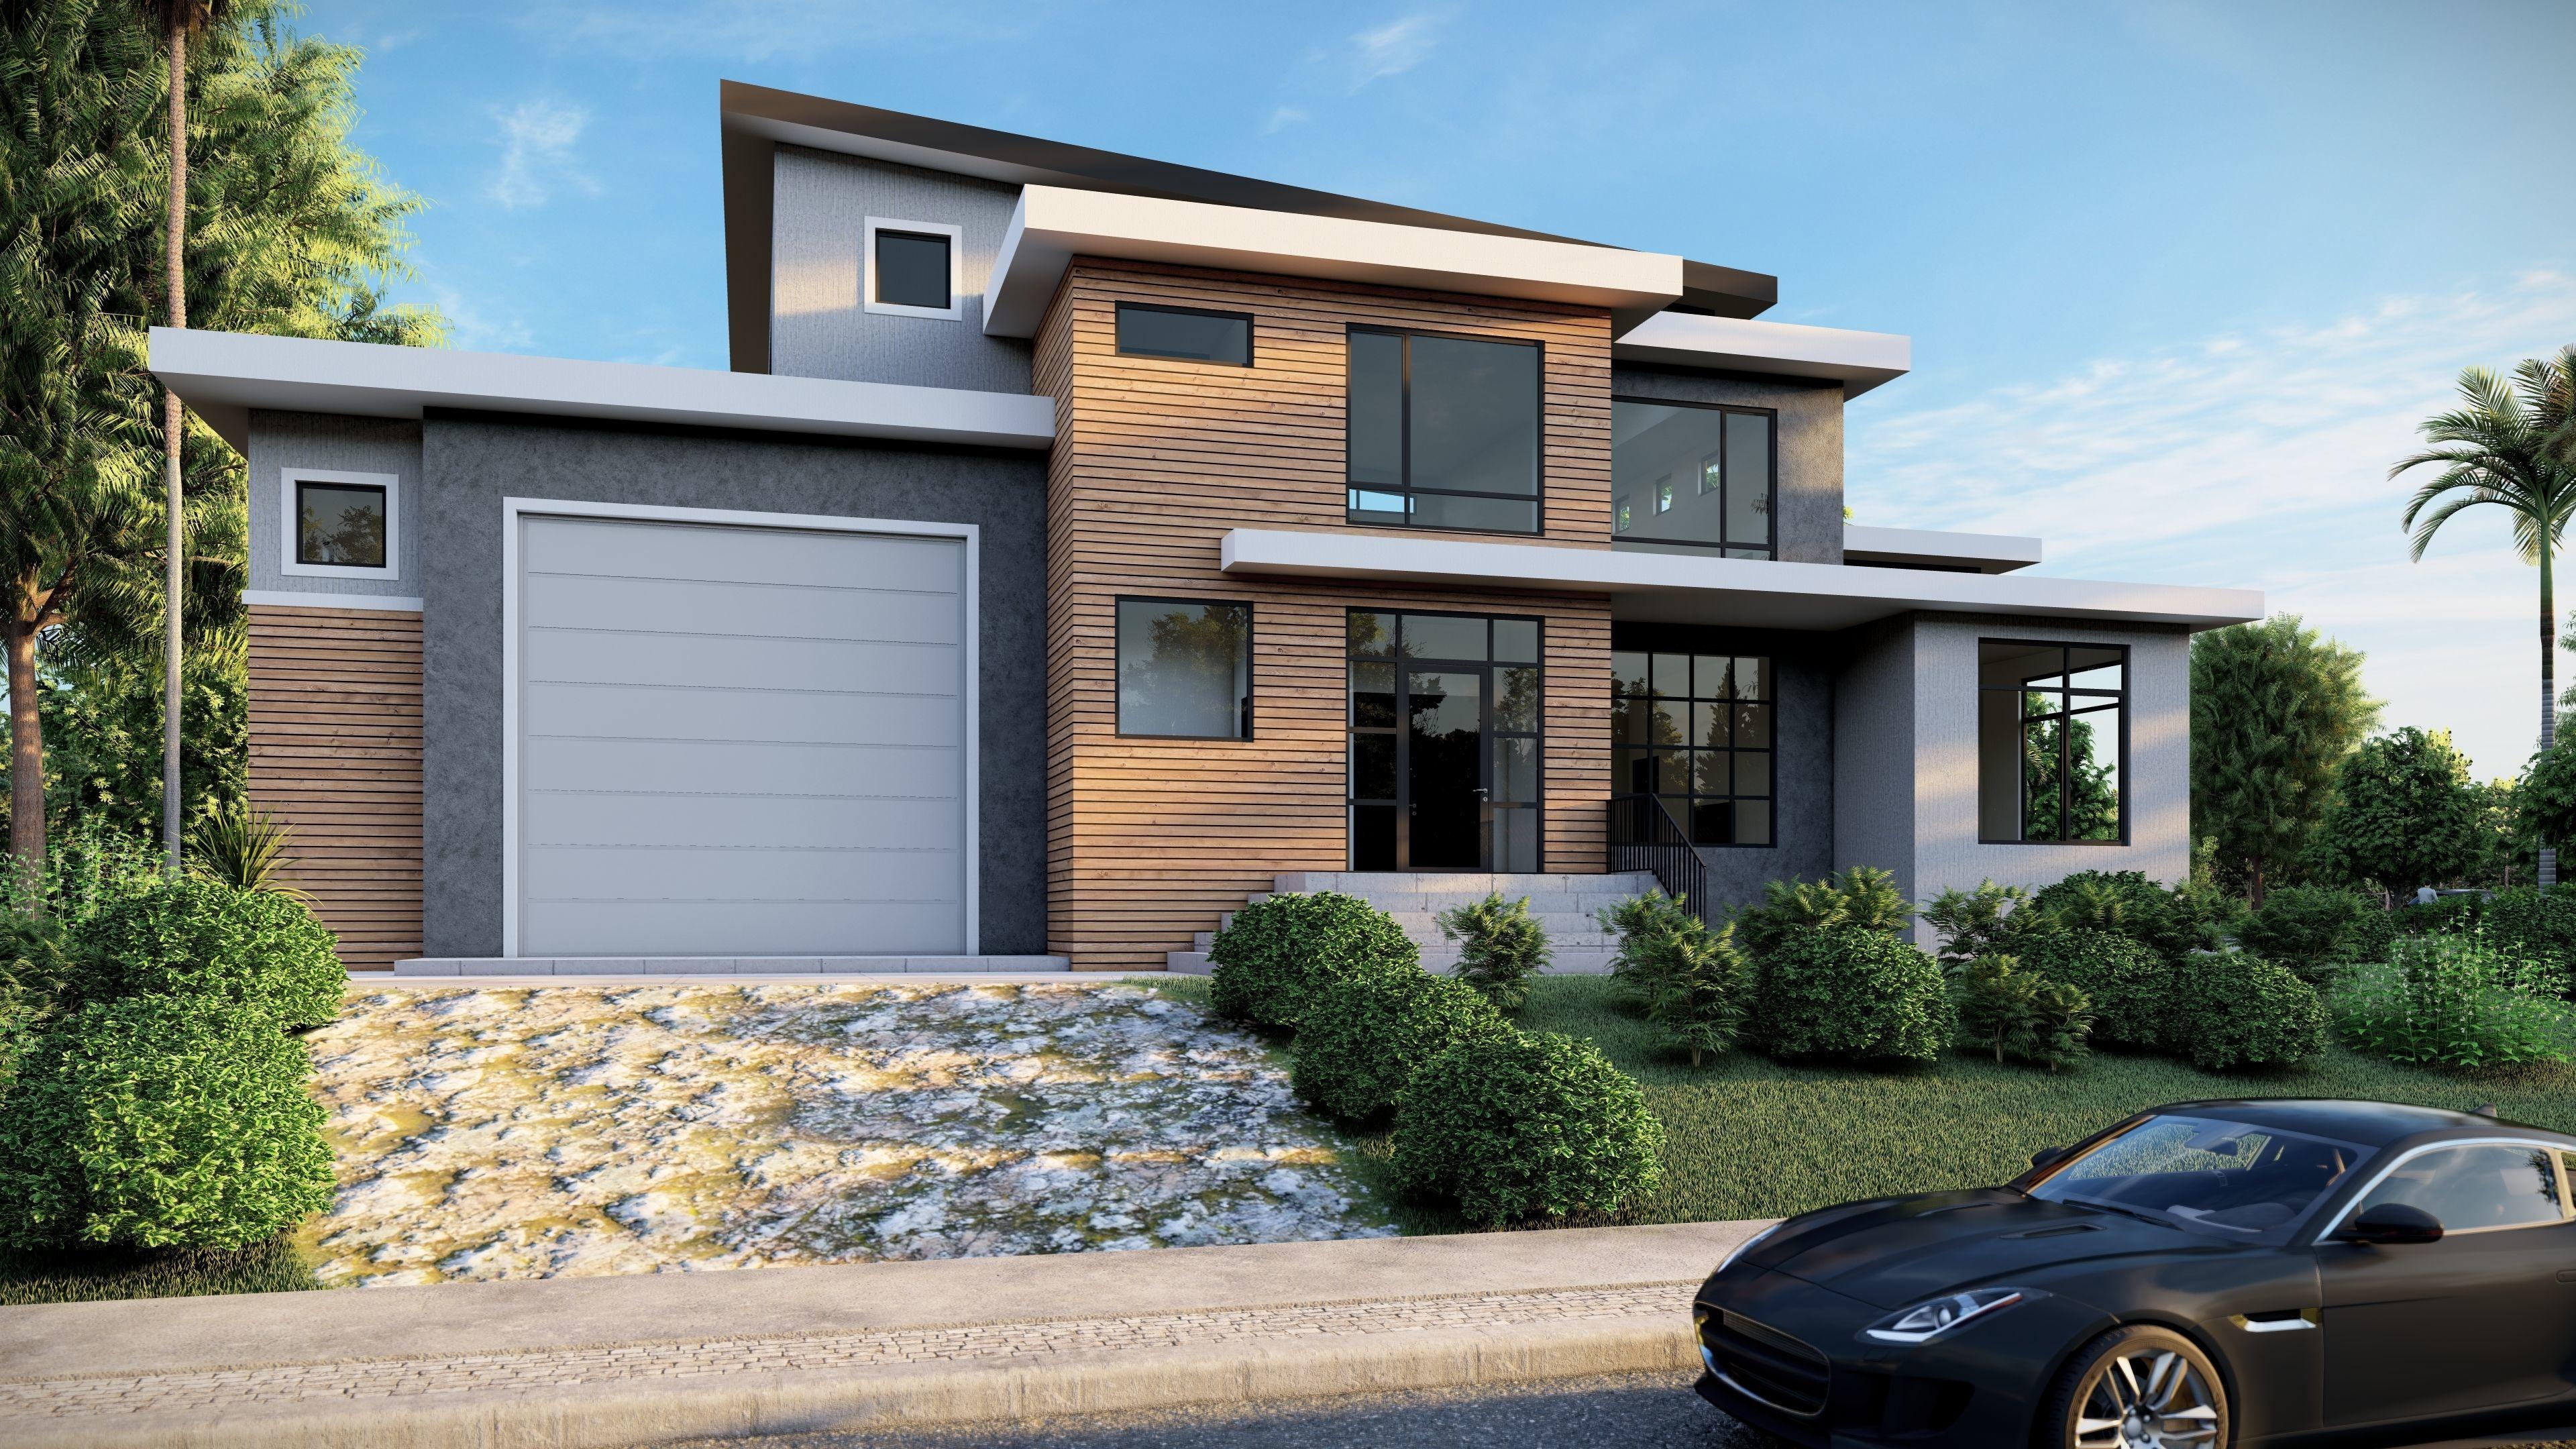 Modern House - BIG-GR